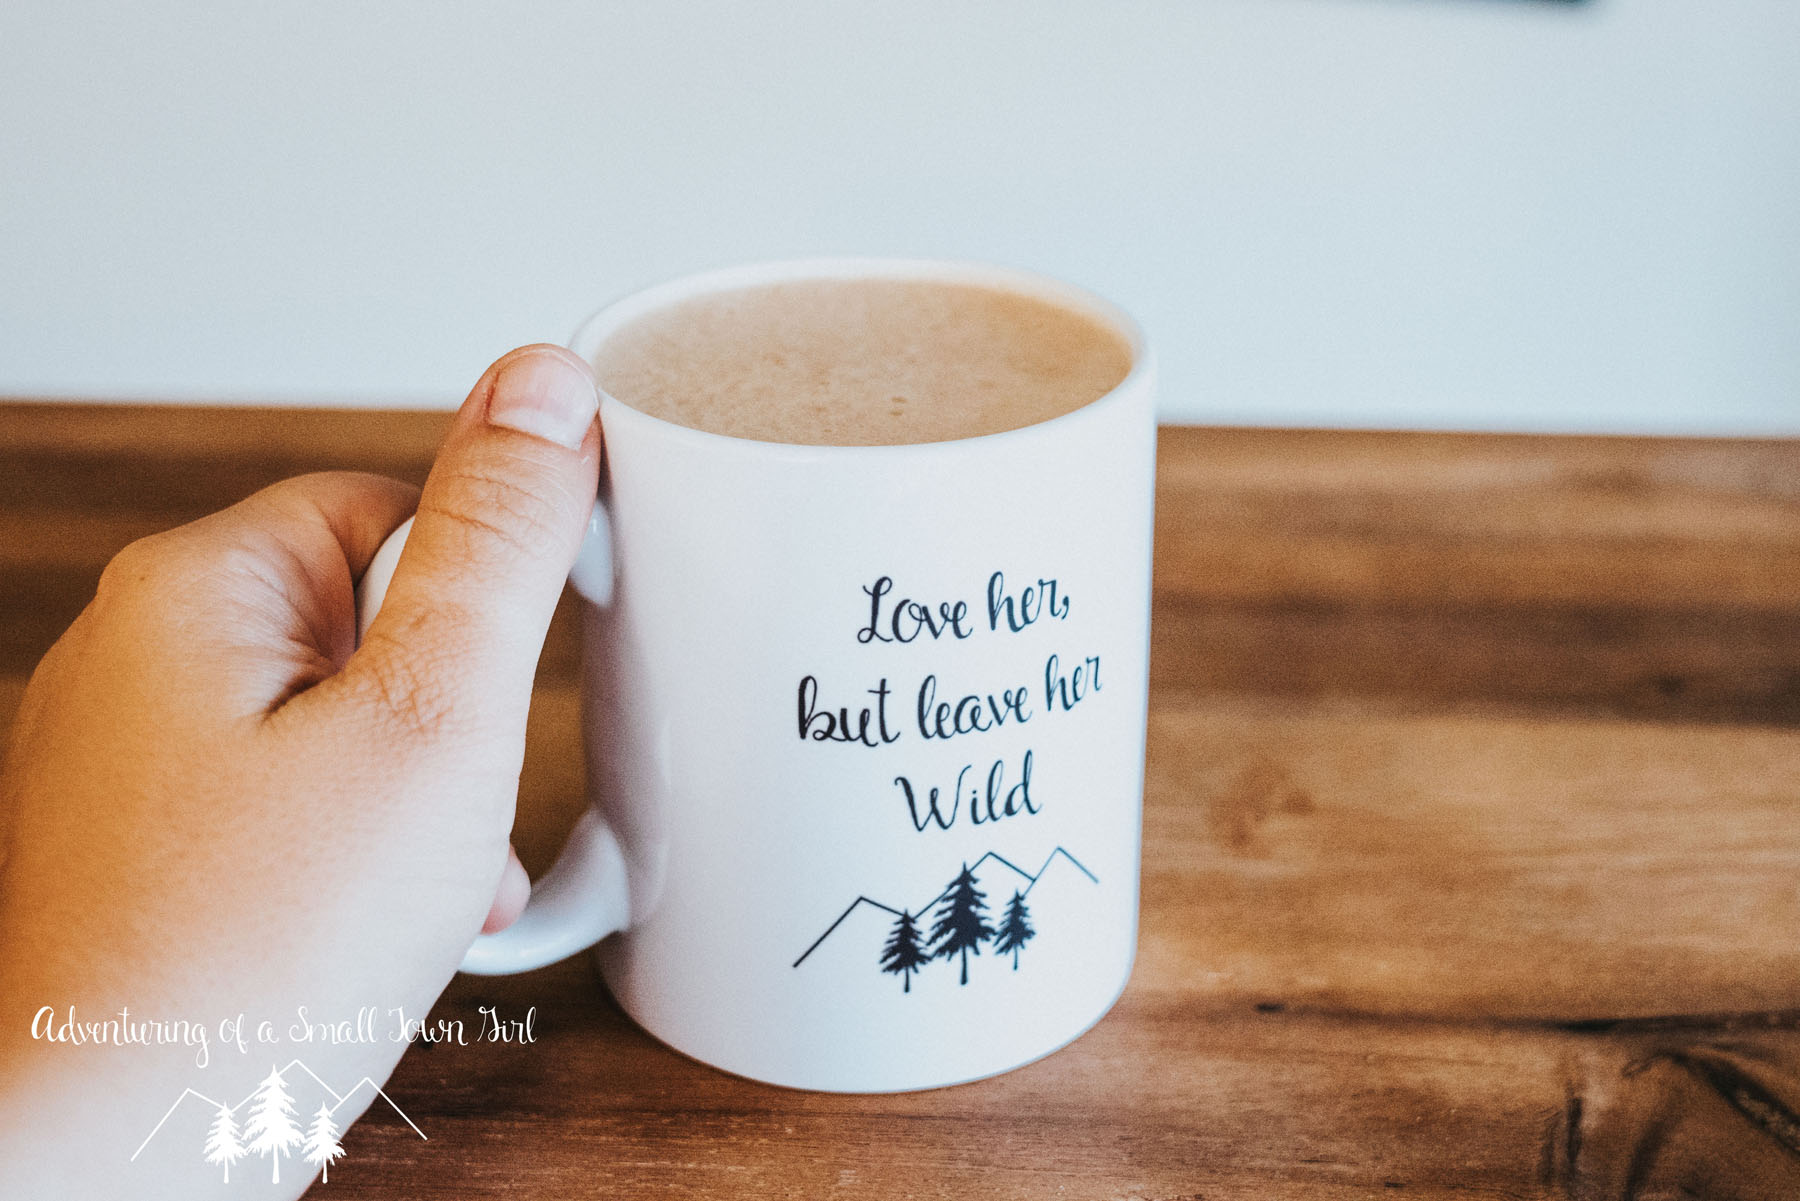 Healthy Latte Recipe - Starbucks Hack - Adventuring of a Small Town Girl-12.jpg